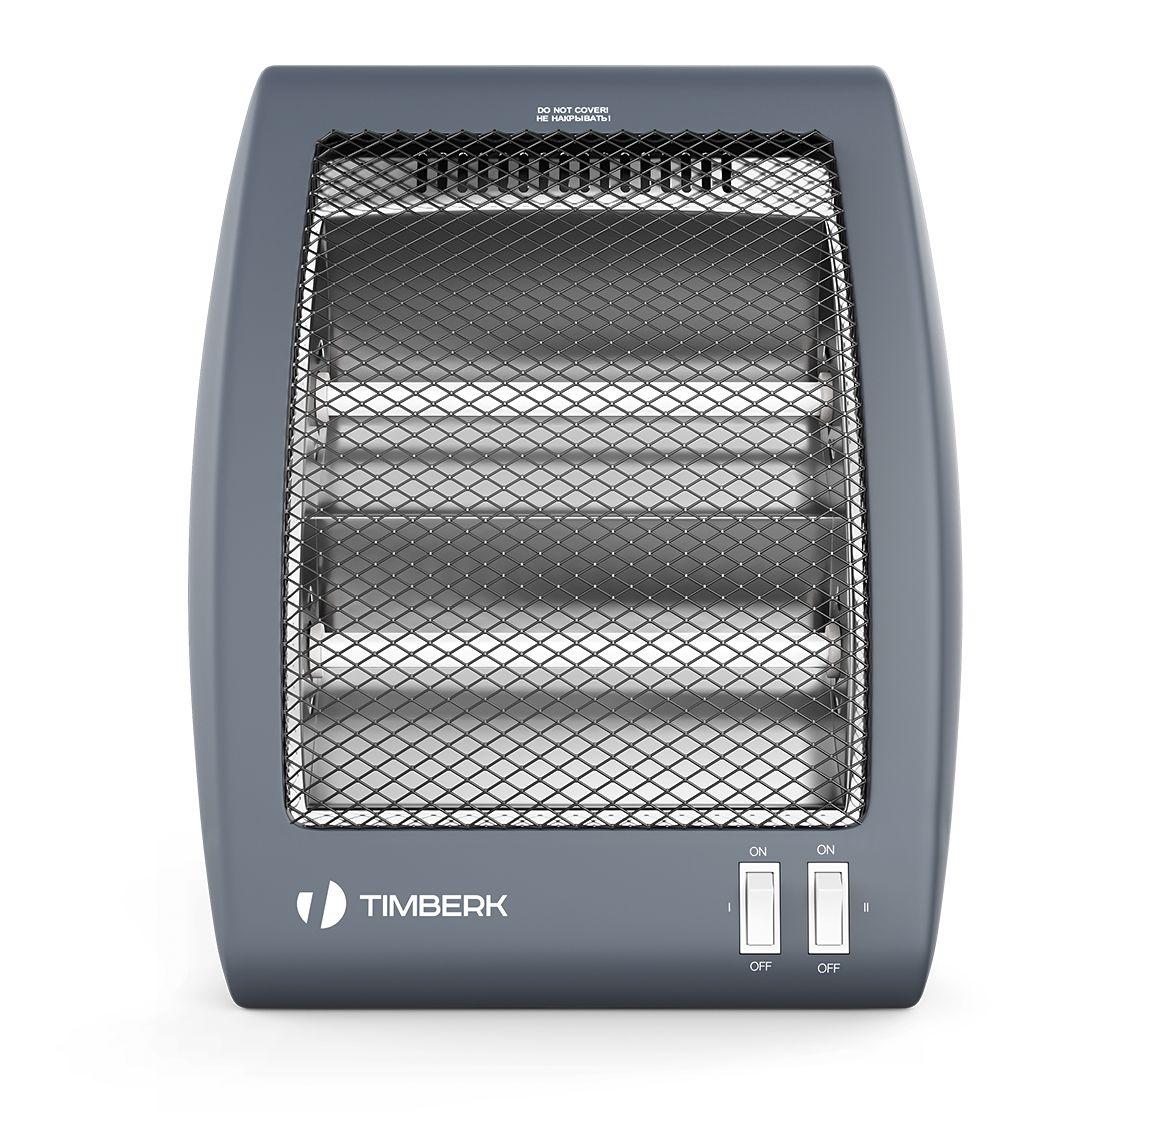 Timberk TCH Q1 800